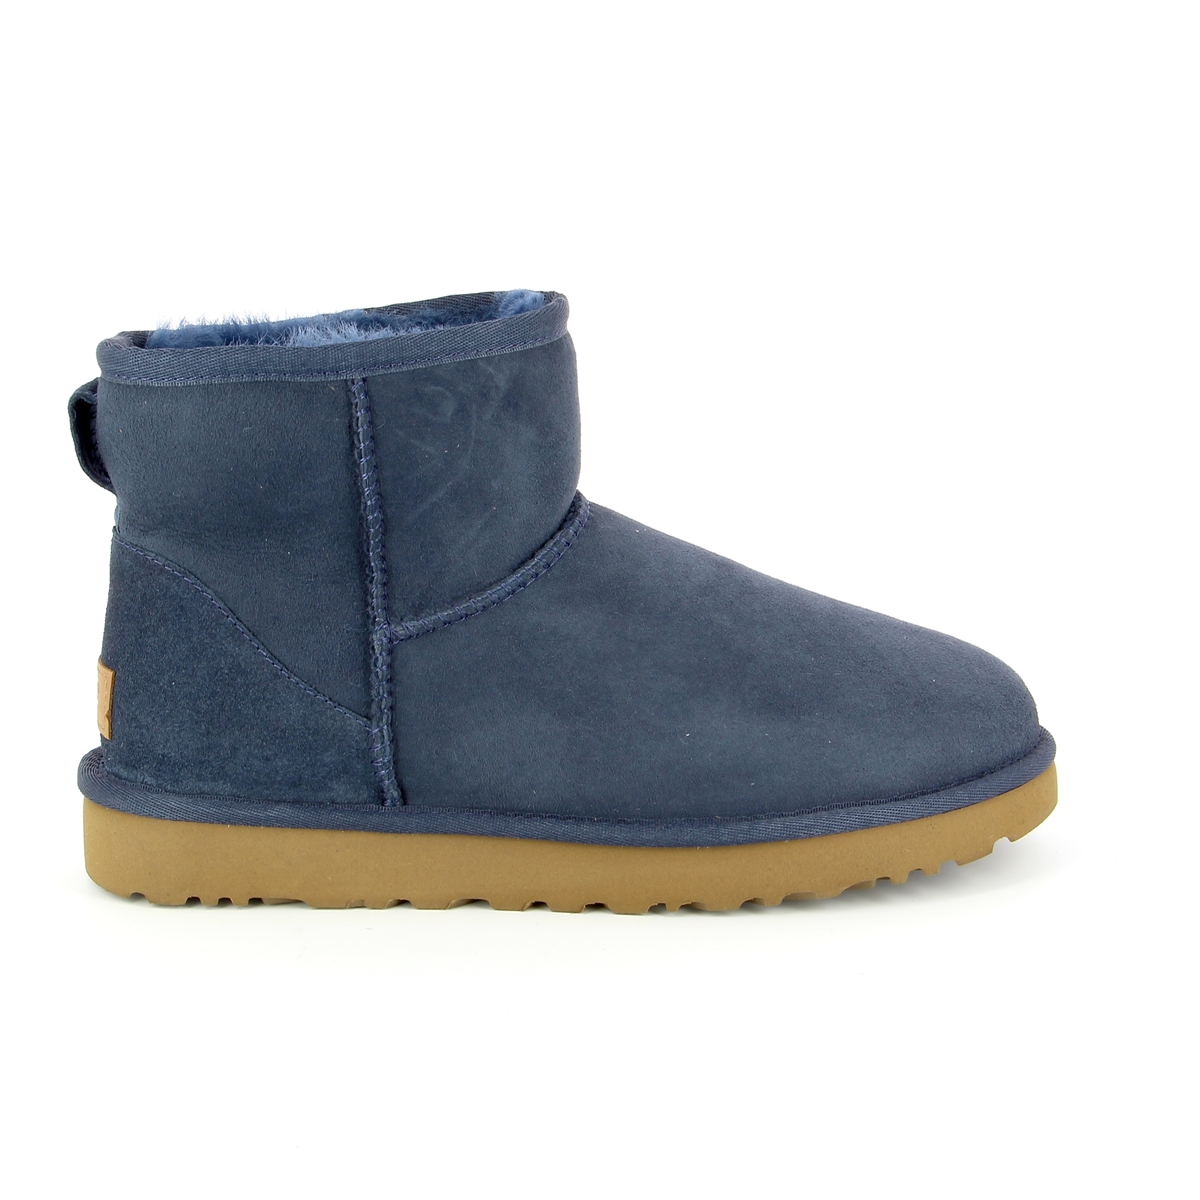 Ugg Boots blauw